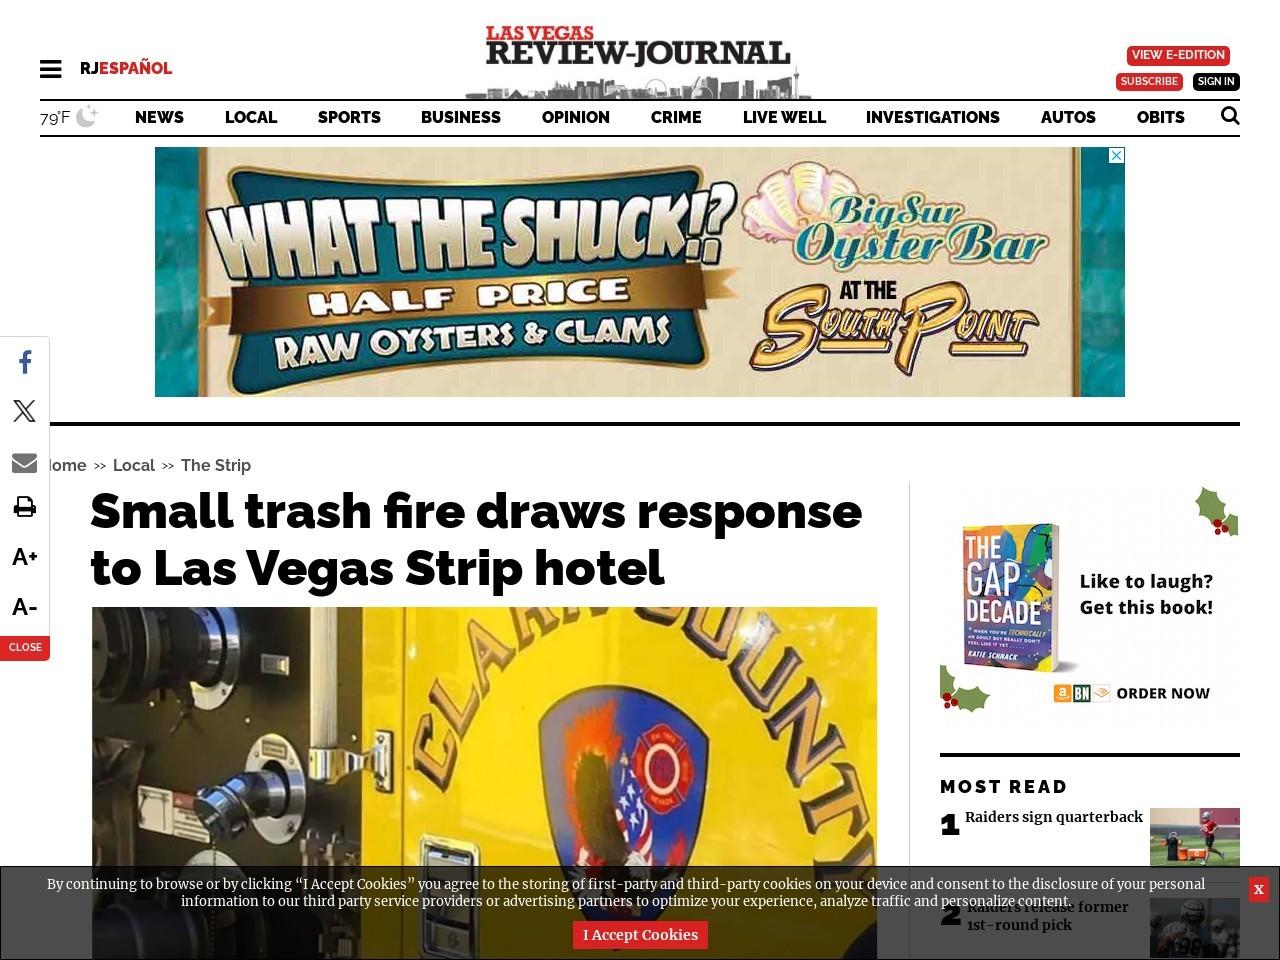 Small trash fire draws response to Las Vegas Strip hotel